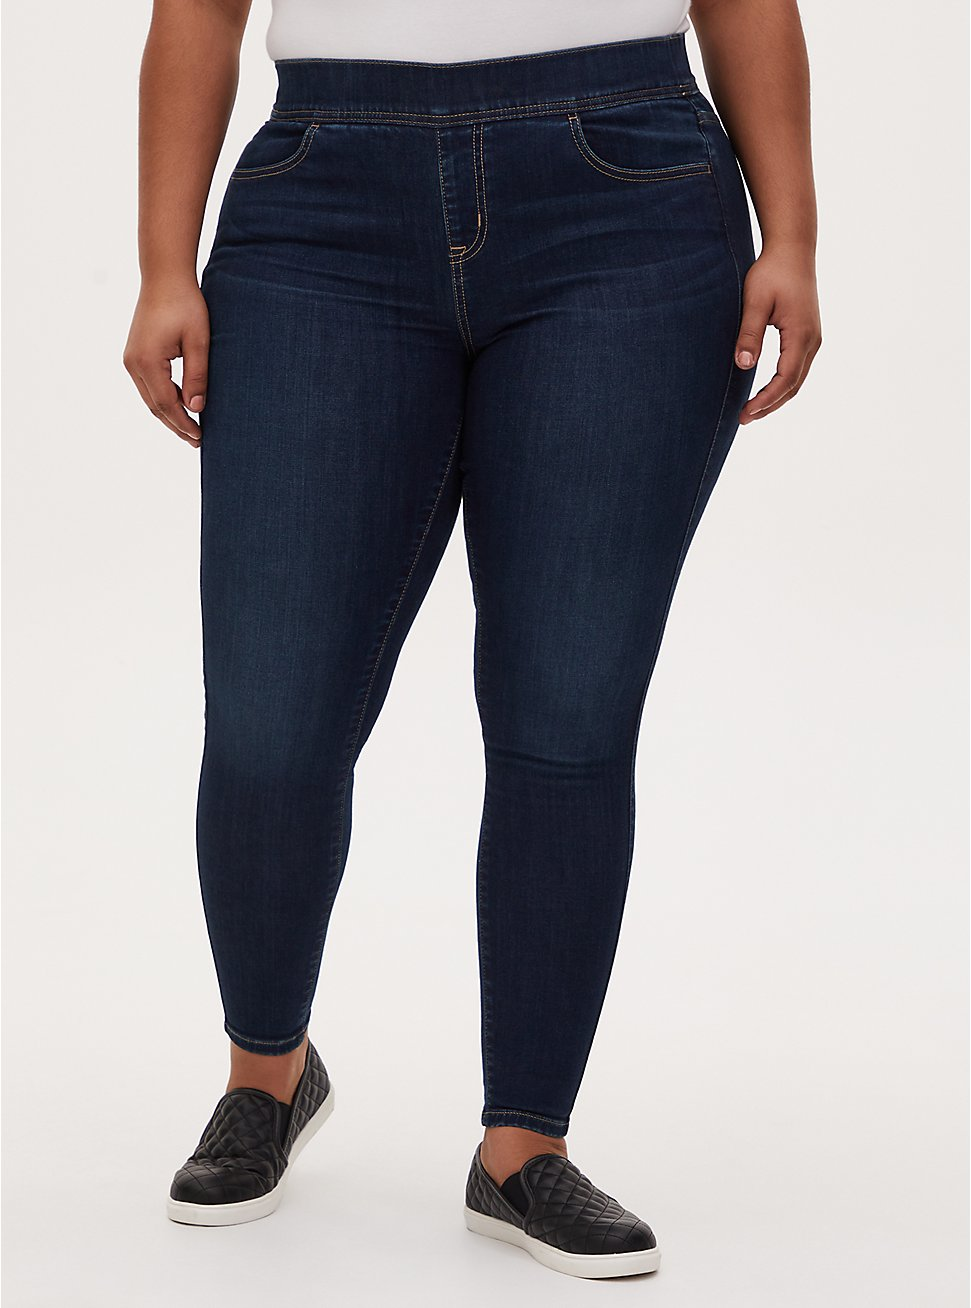 Plus Size Lean Jean - Super Soft Dark Wash , BASIN, hi-res